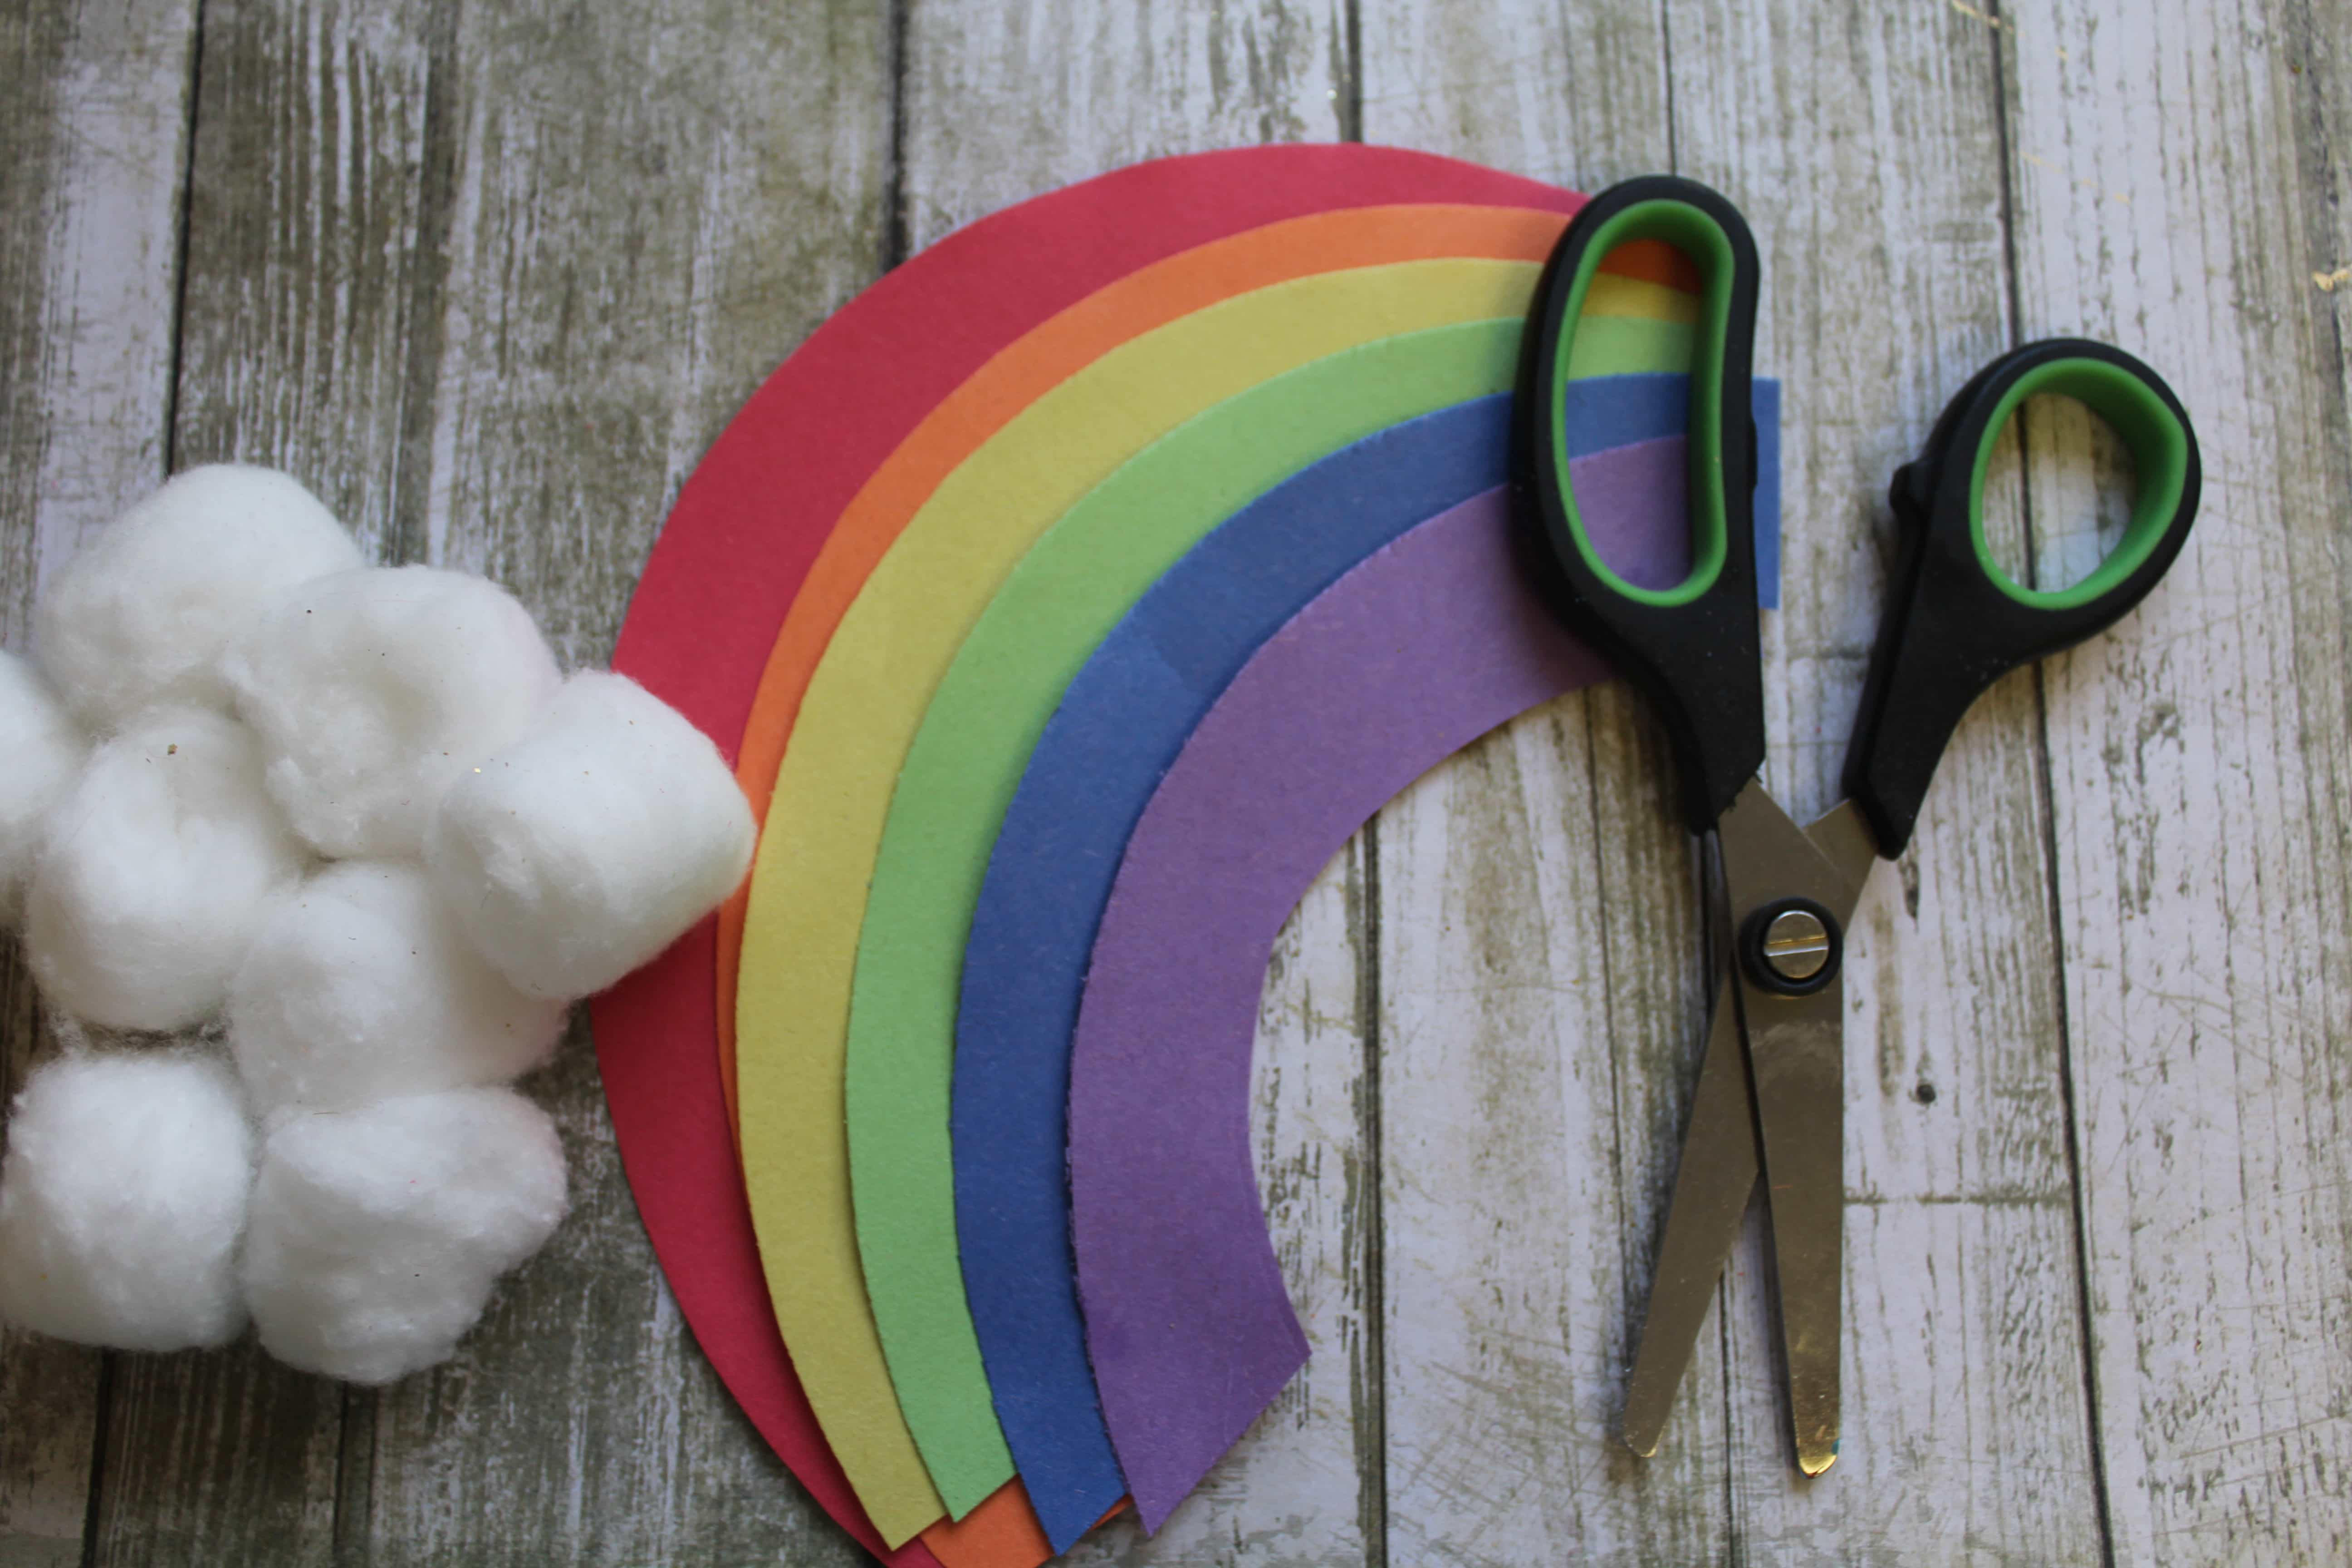 St. Patrick's Day Leprechaun Trap Craft for Kids making rainbow